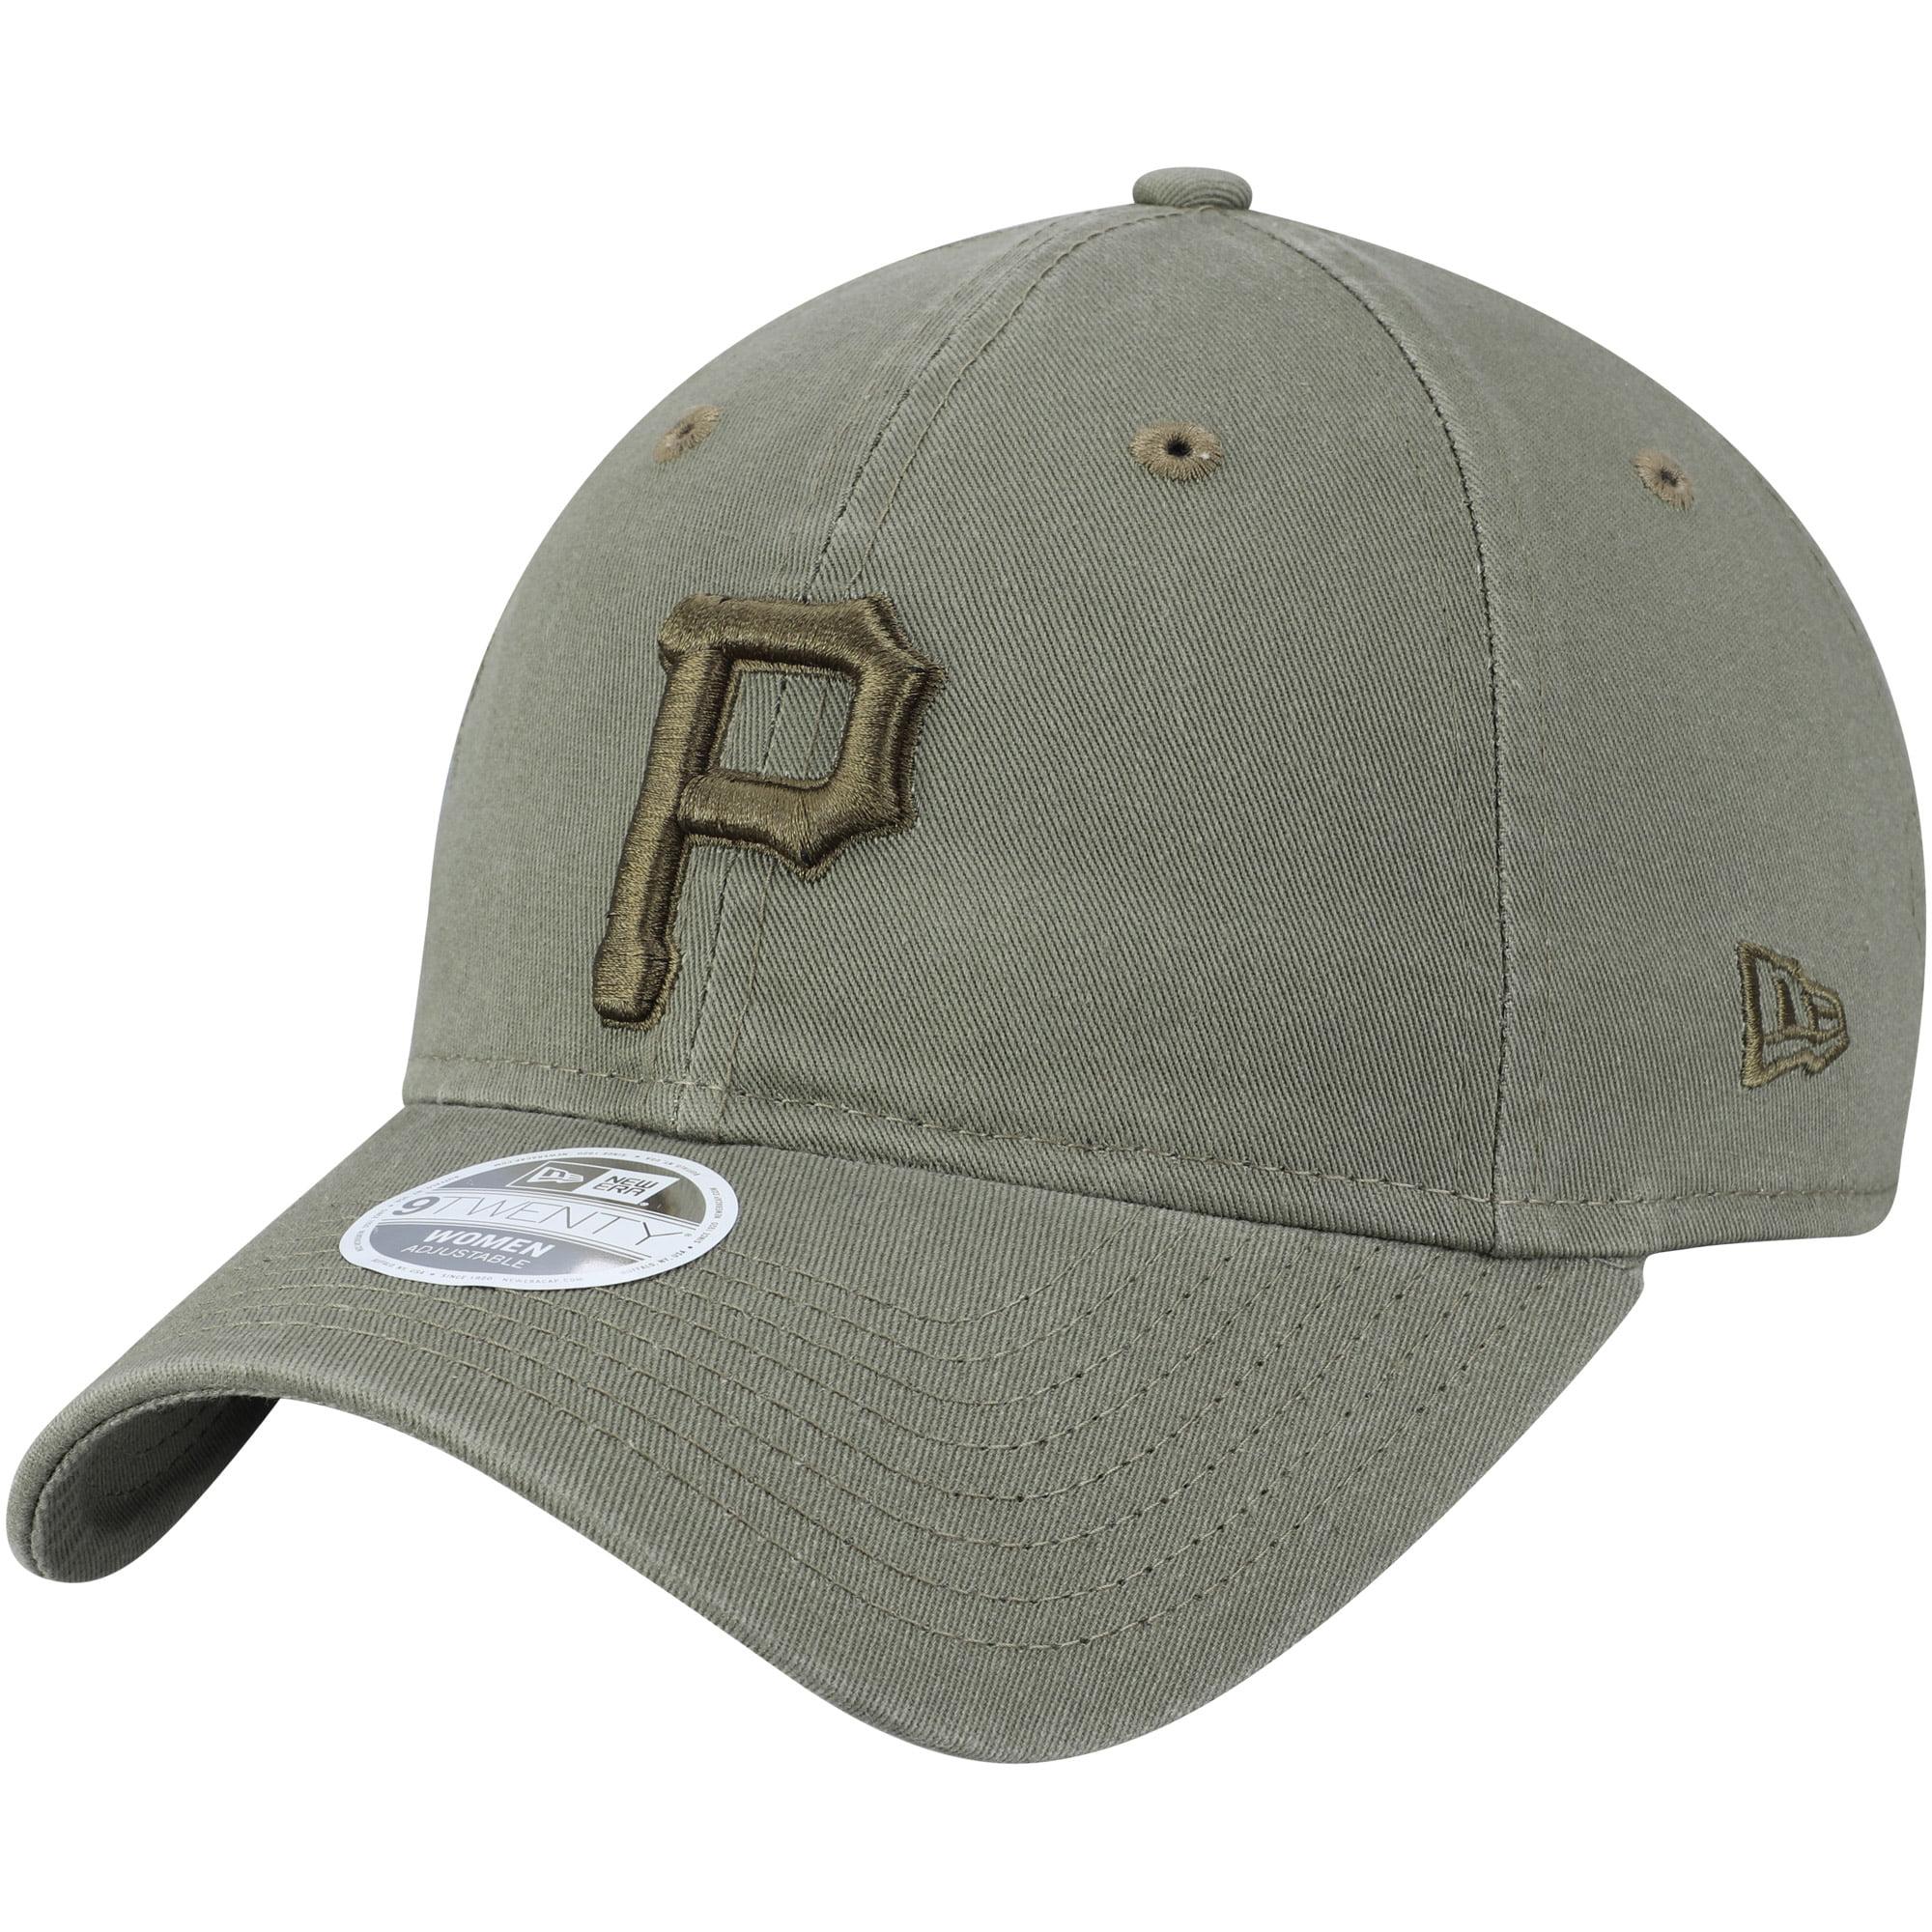 Pittsburgh Pirates New Era Women's Bark Tonal Core Classic 9TWENTY Adjustable Hat - Olive - OSFA